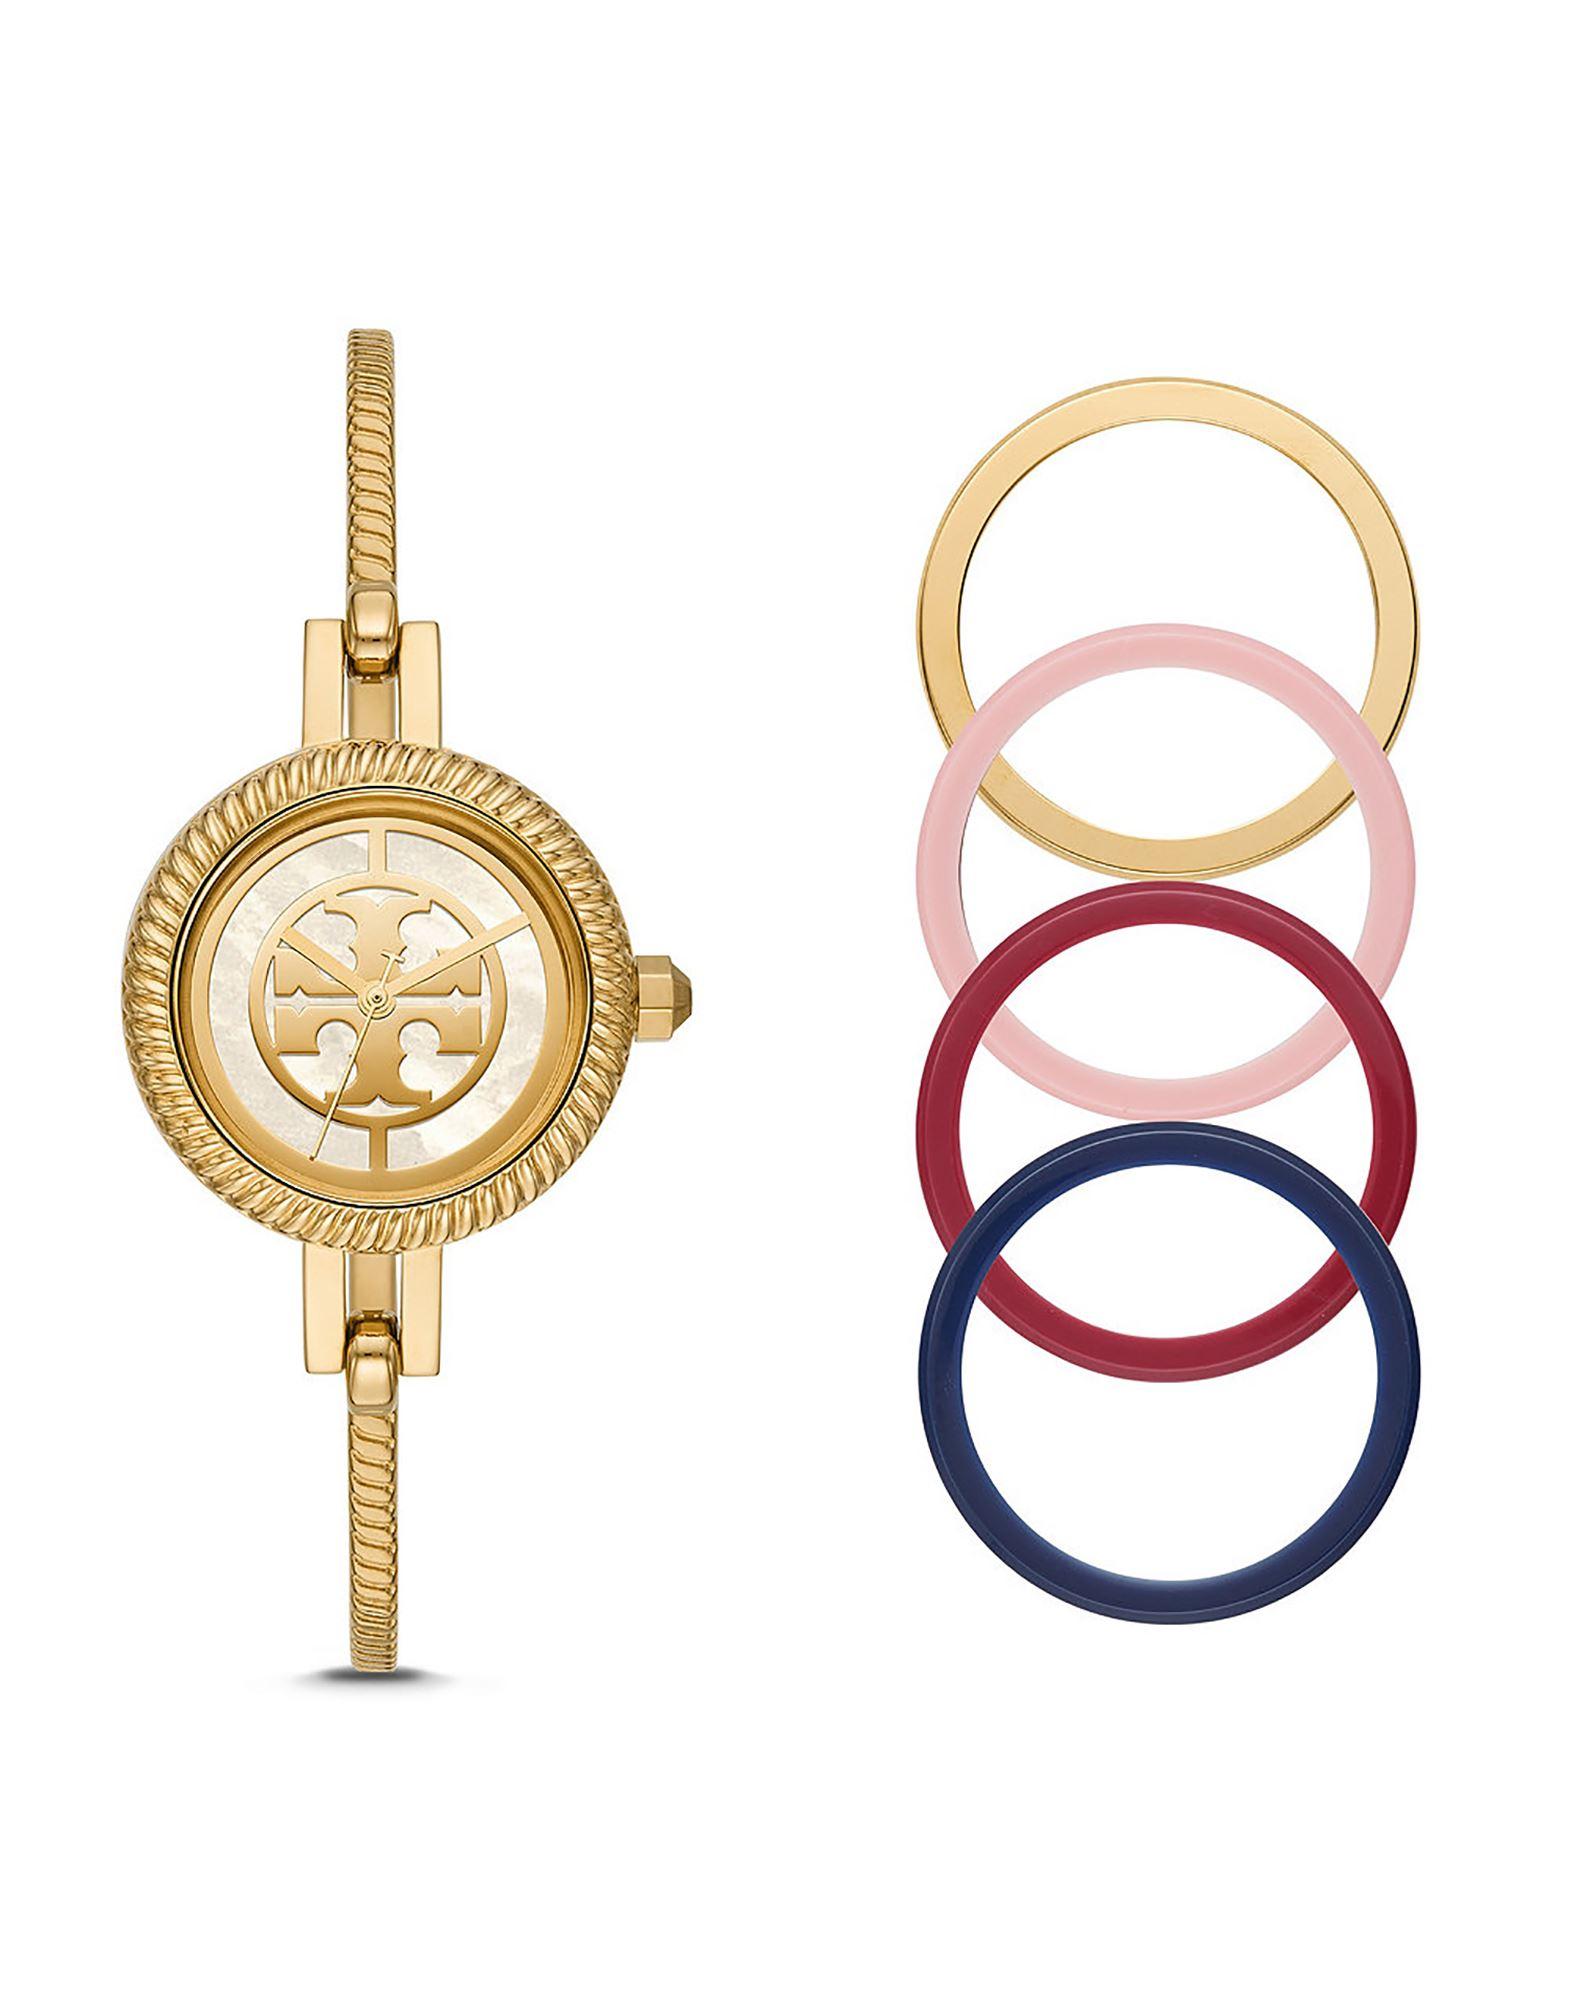 TORY BURCH Wrist watches - Item 58049503